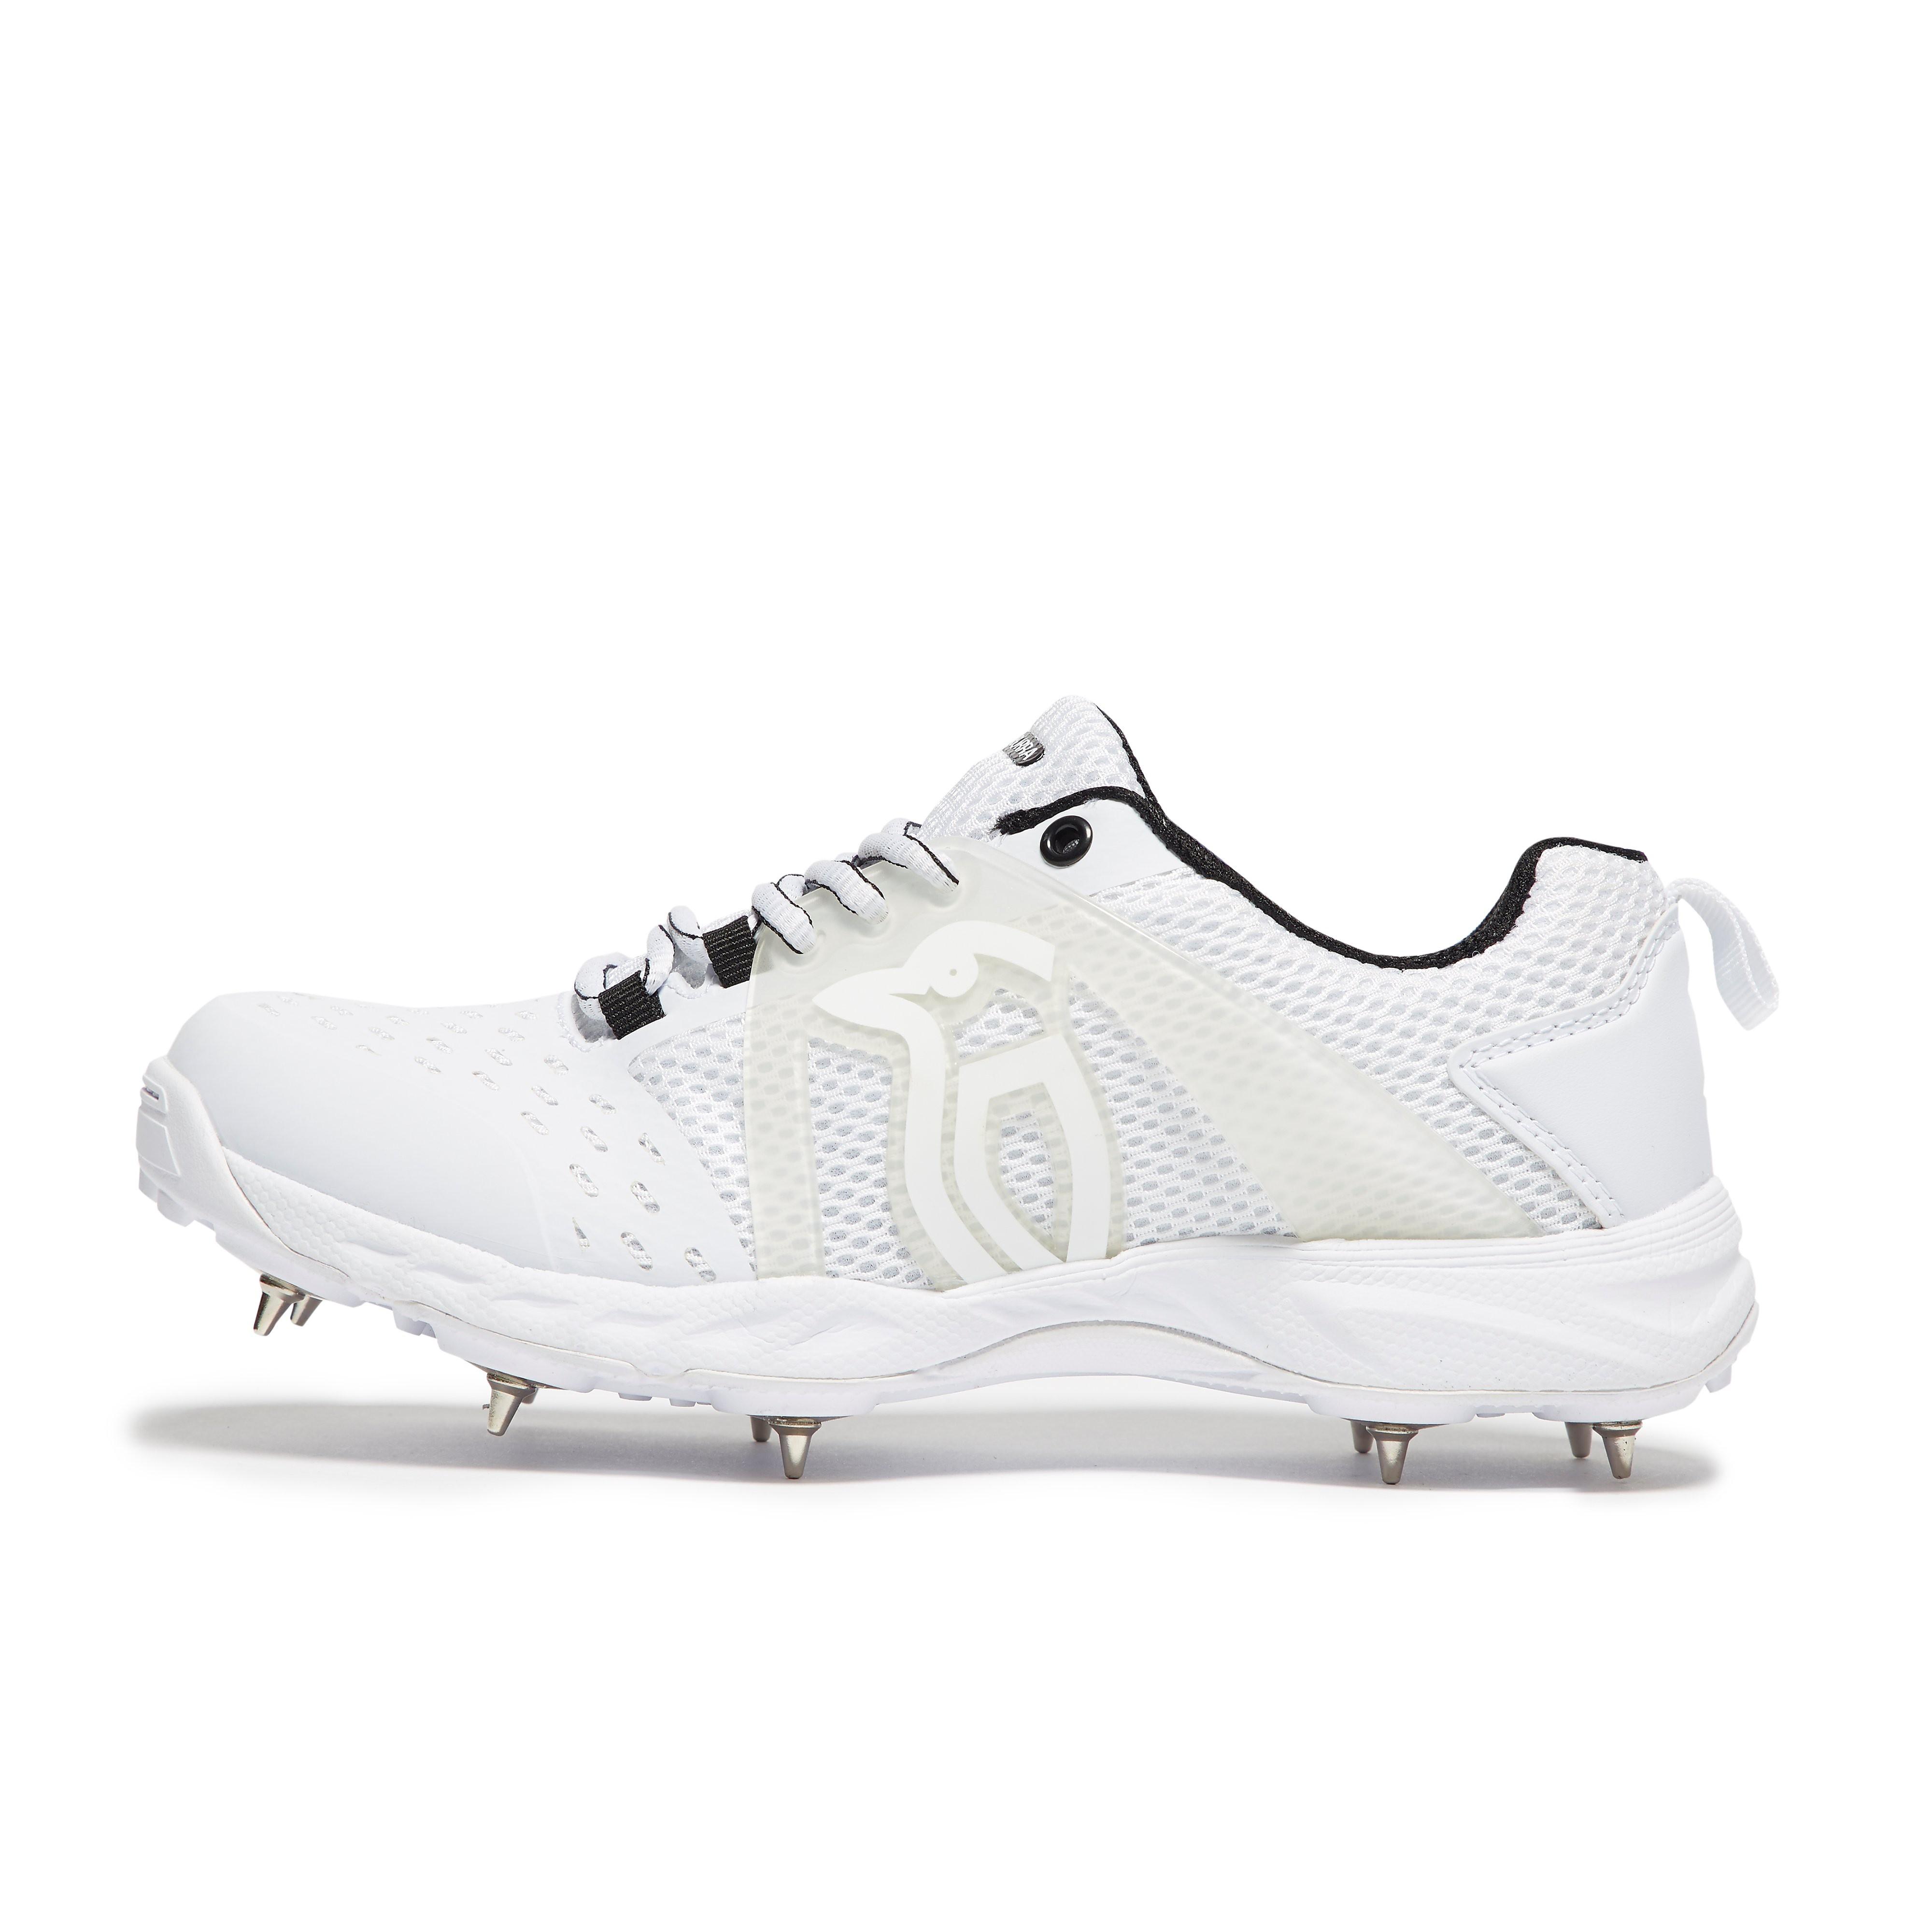 Kookaburra KCS 2000 Spike Junior Cricket Shoes